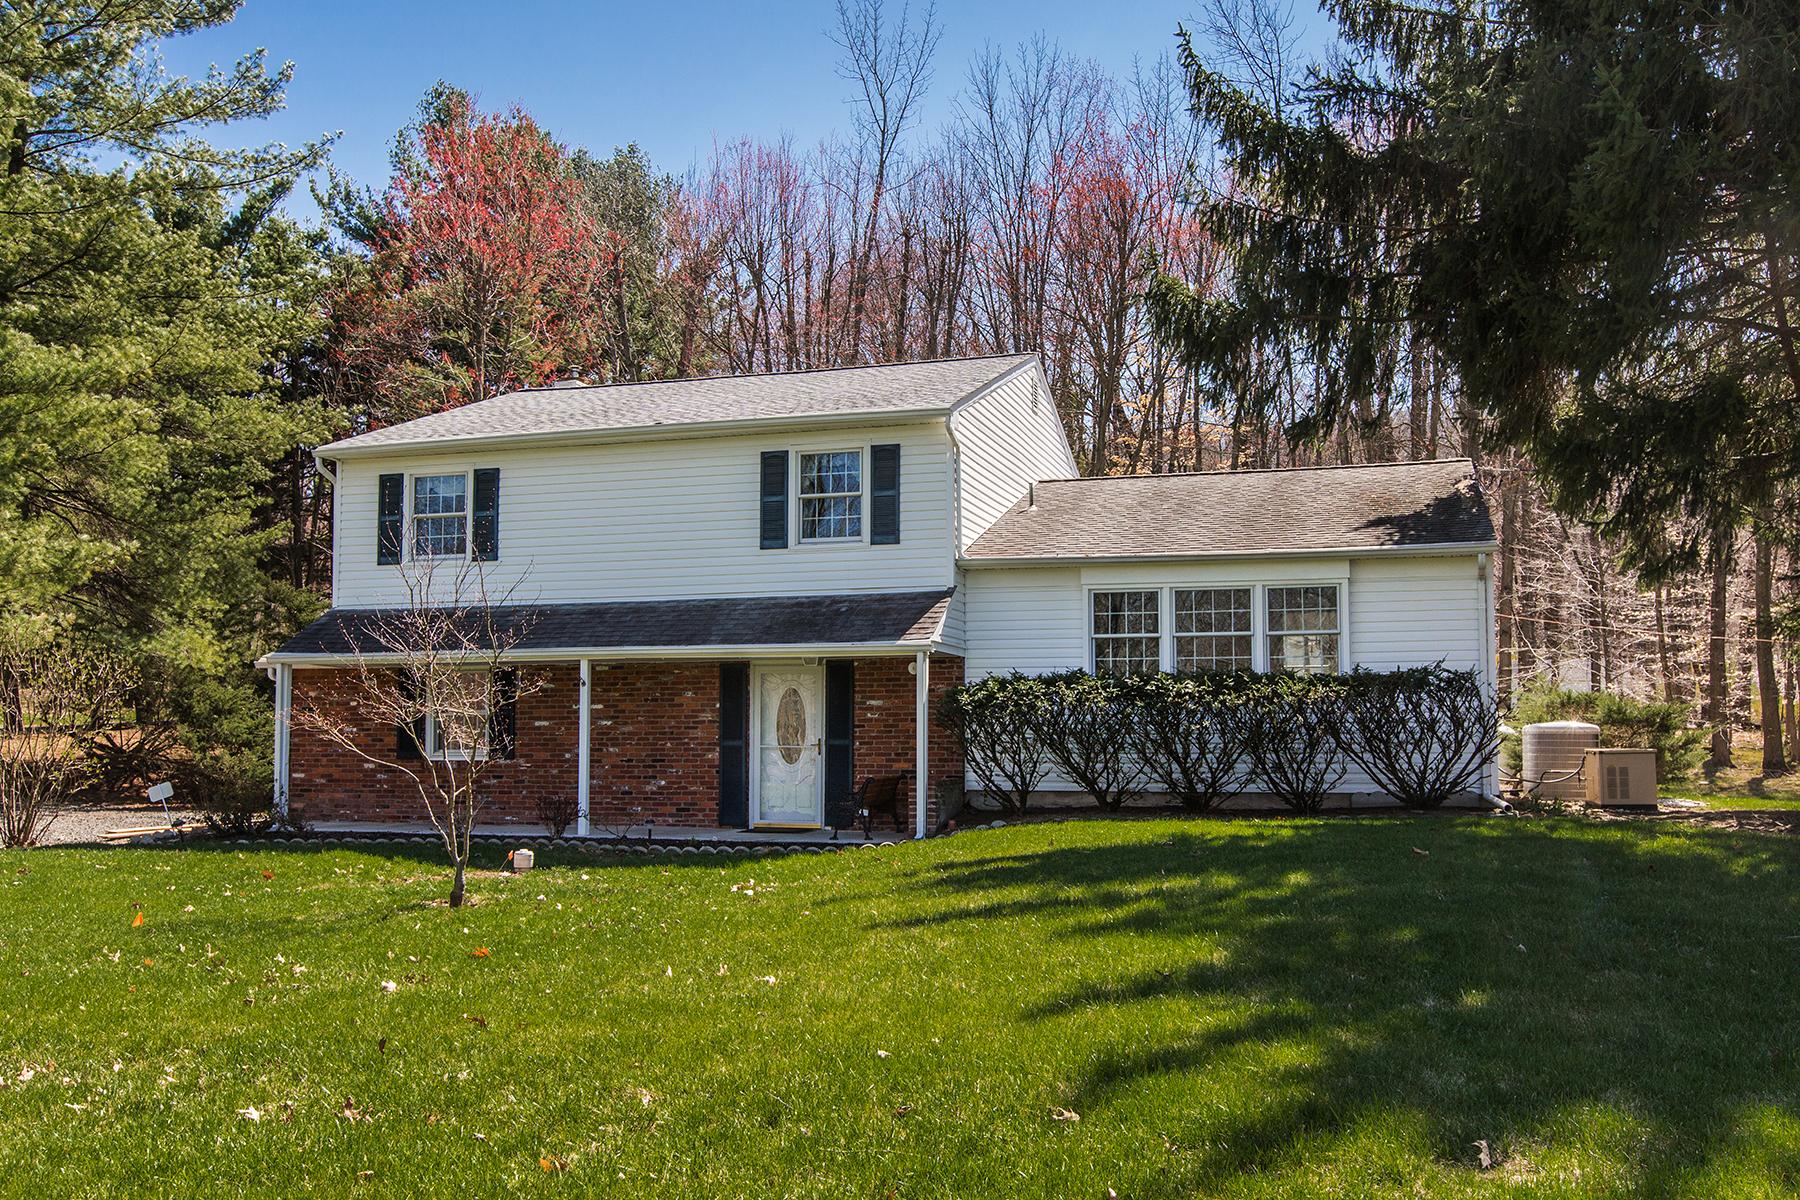 獨棟家庭住宅 為 出售 在 New Hope, PA 157 Aquetong Rd New Hope, 賓夕法尼亞州, 18938 美國